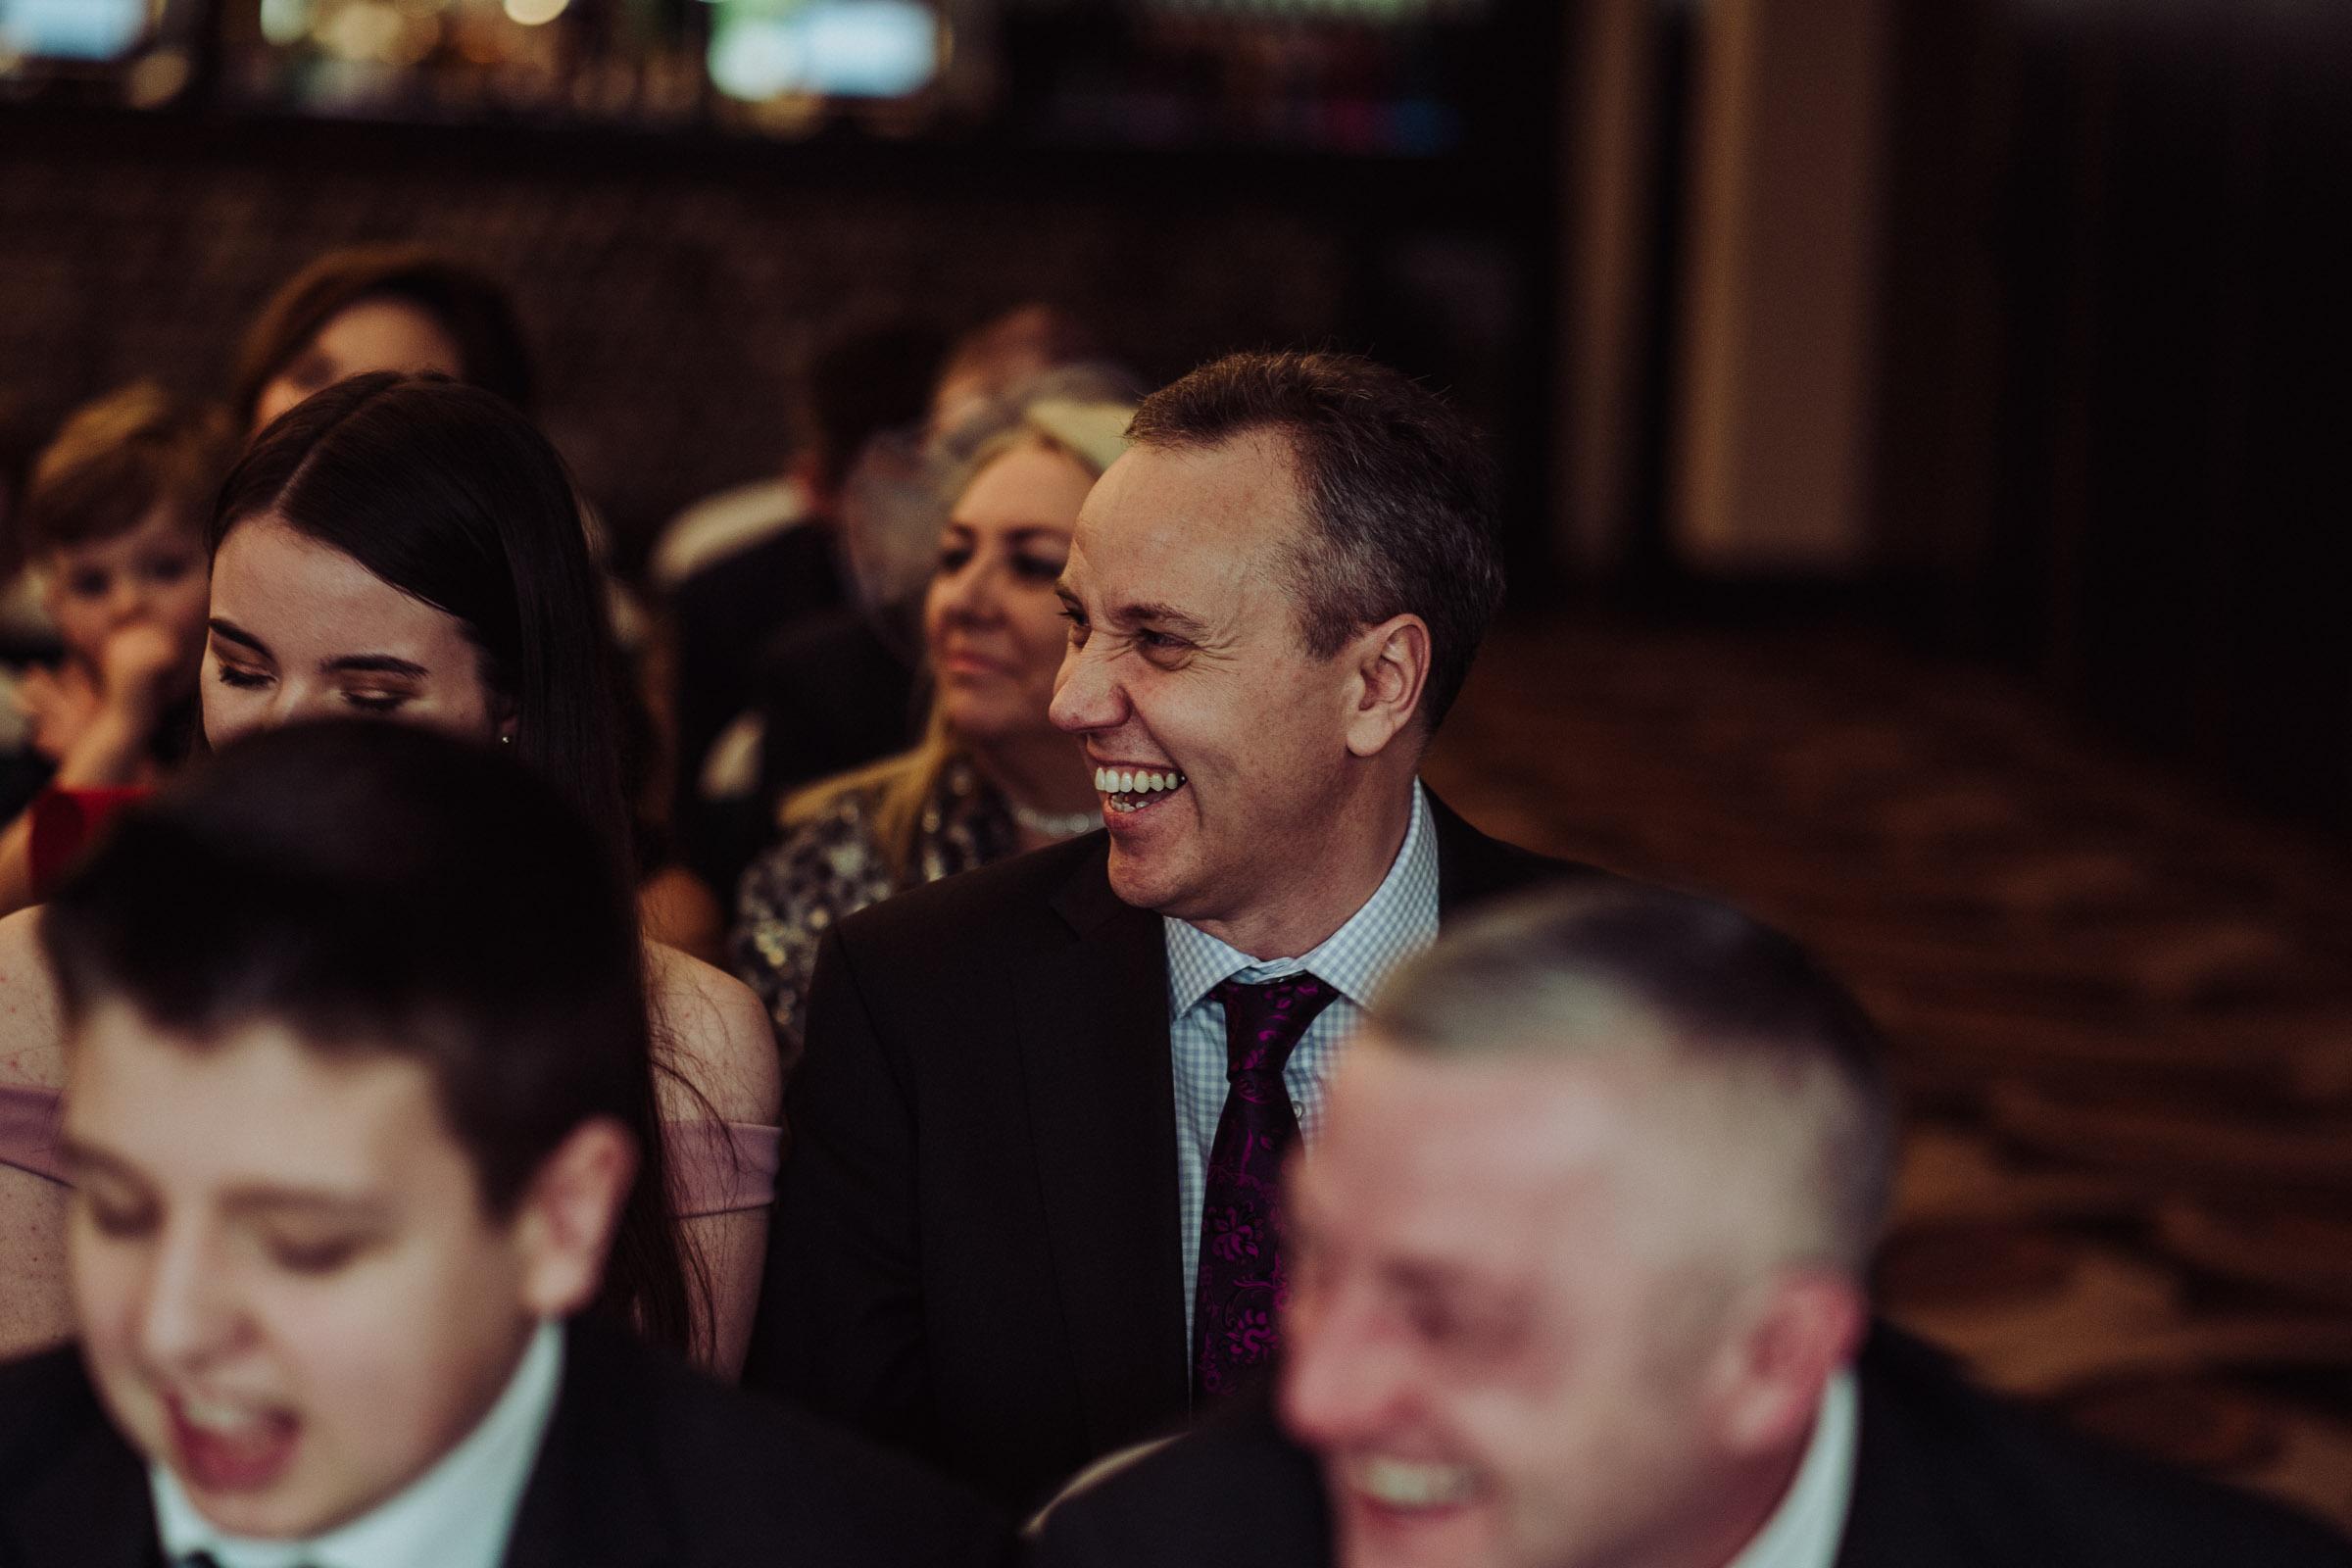 Radstone-Wedding-Dearly-Photography-Scotland (25 of 50).jpg